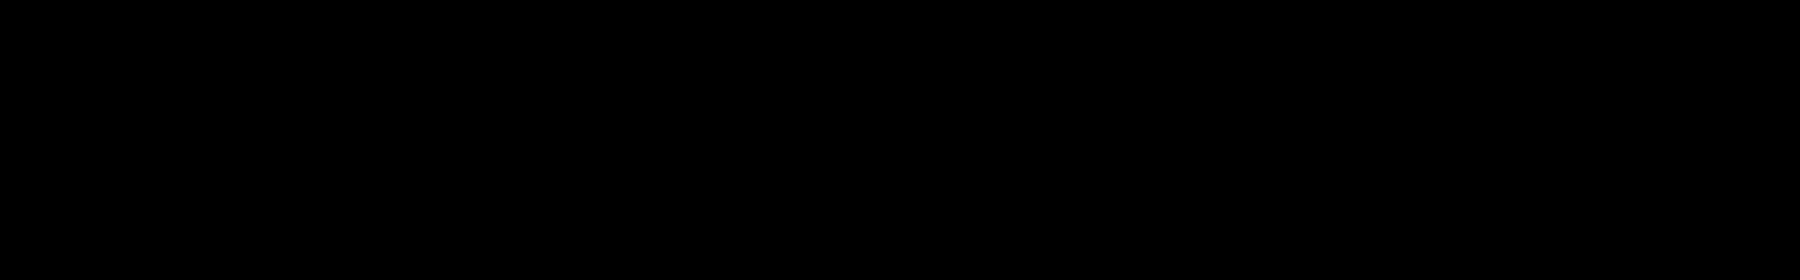 Dubstep Presets By Wubbaduck audio waveform